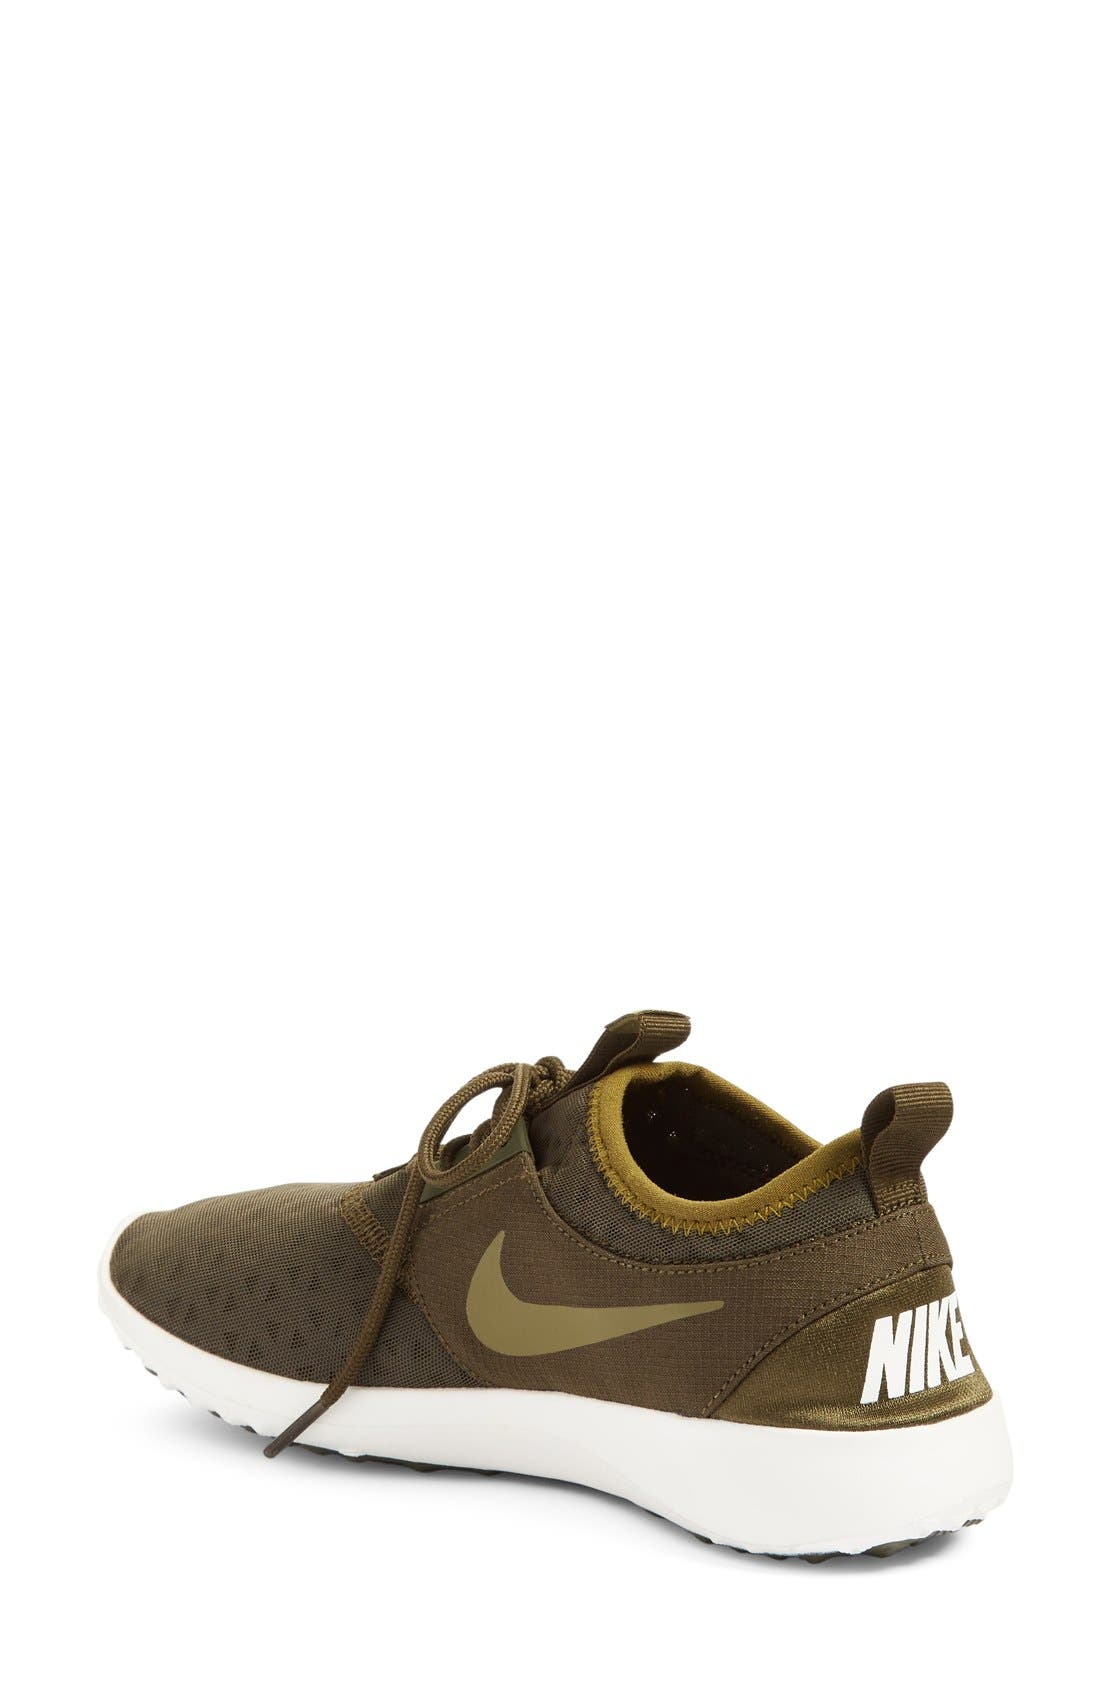 ,                             'Juvenate' Sneaker,                             Alternate thumbnail 167, color,                             307